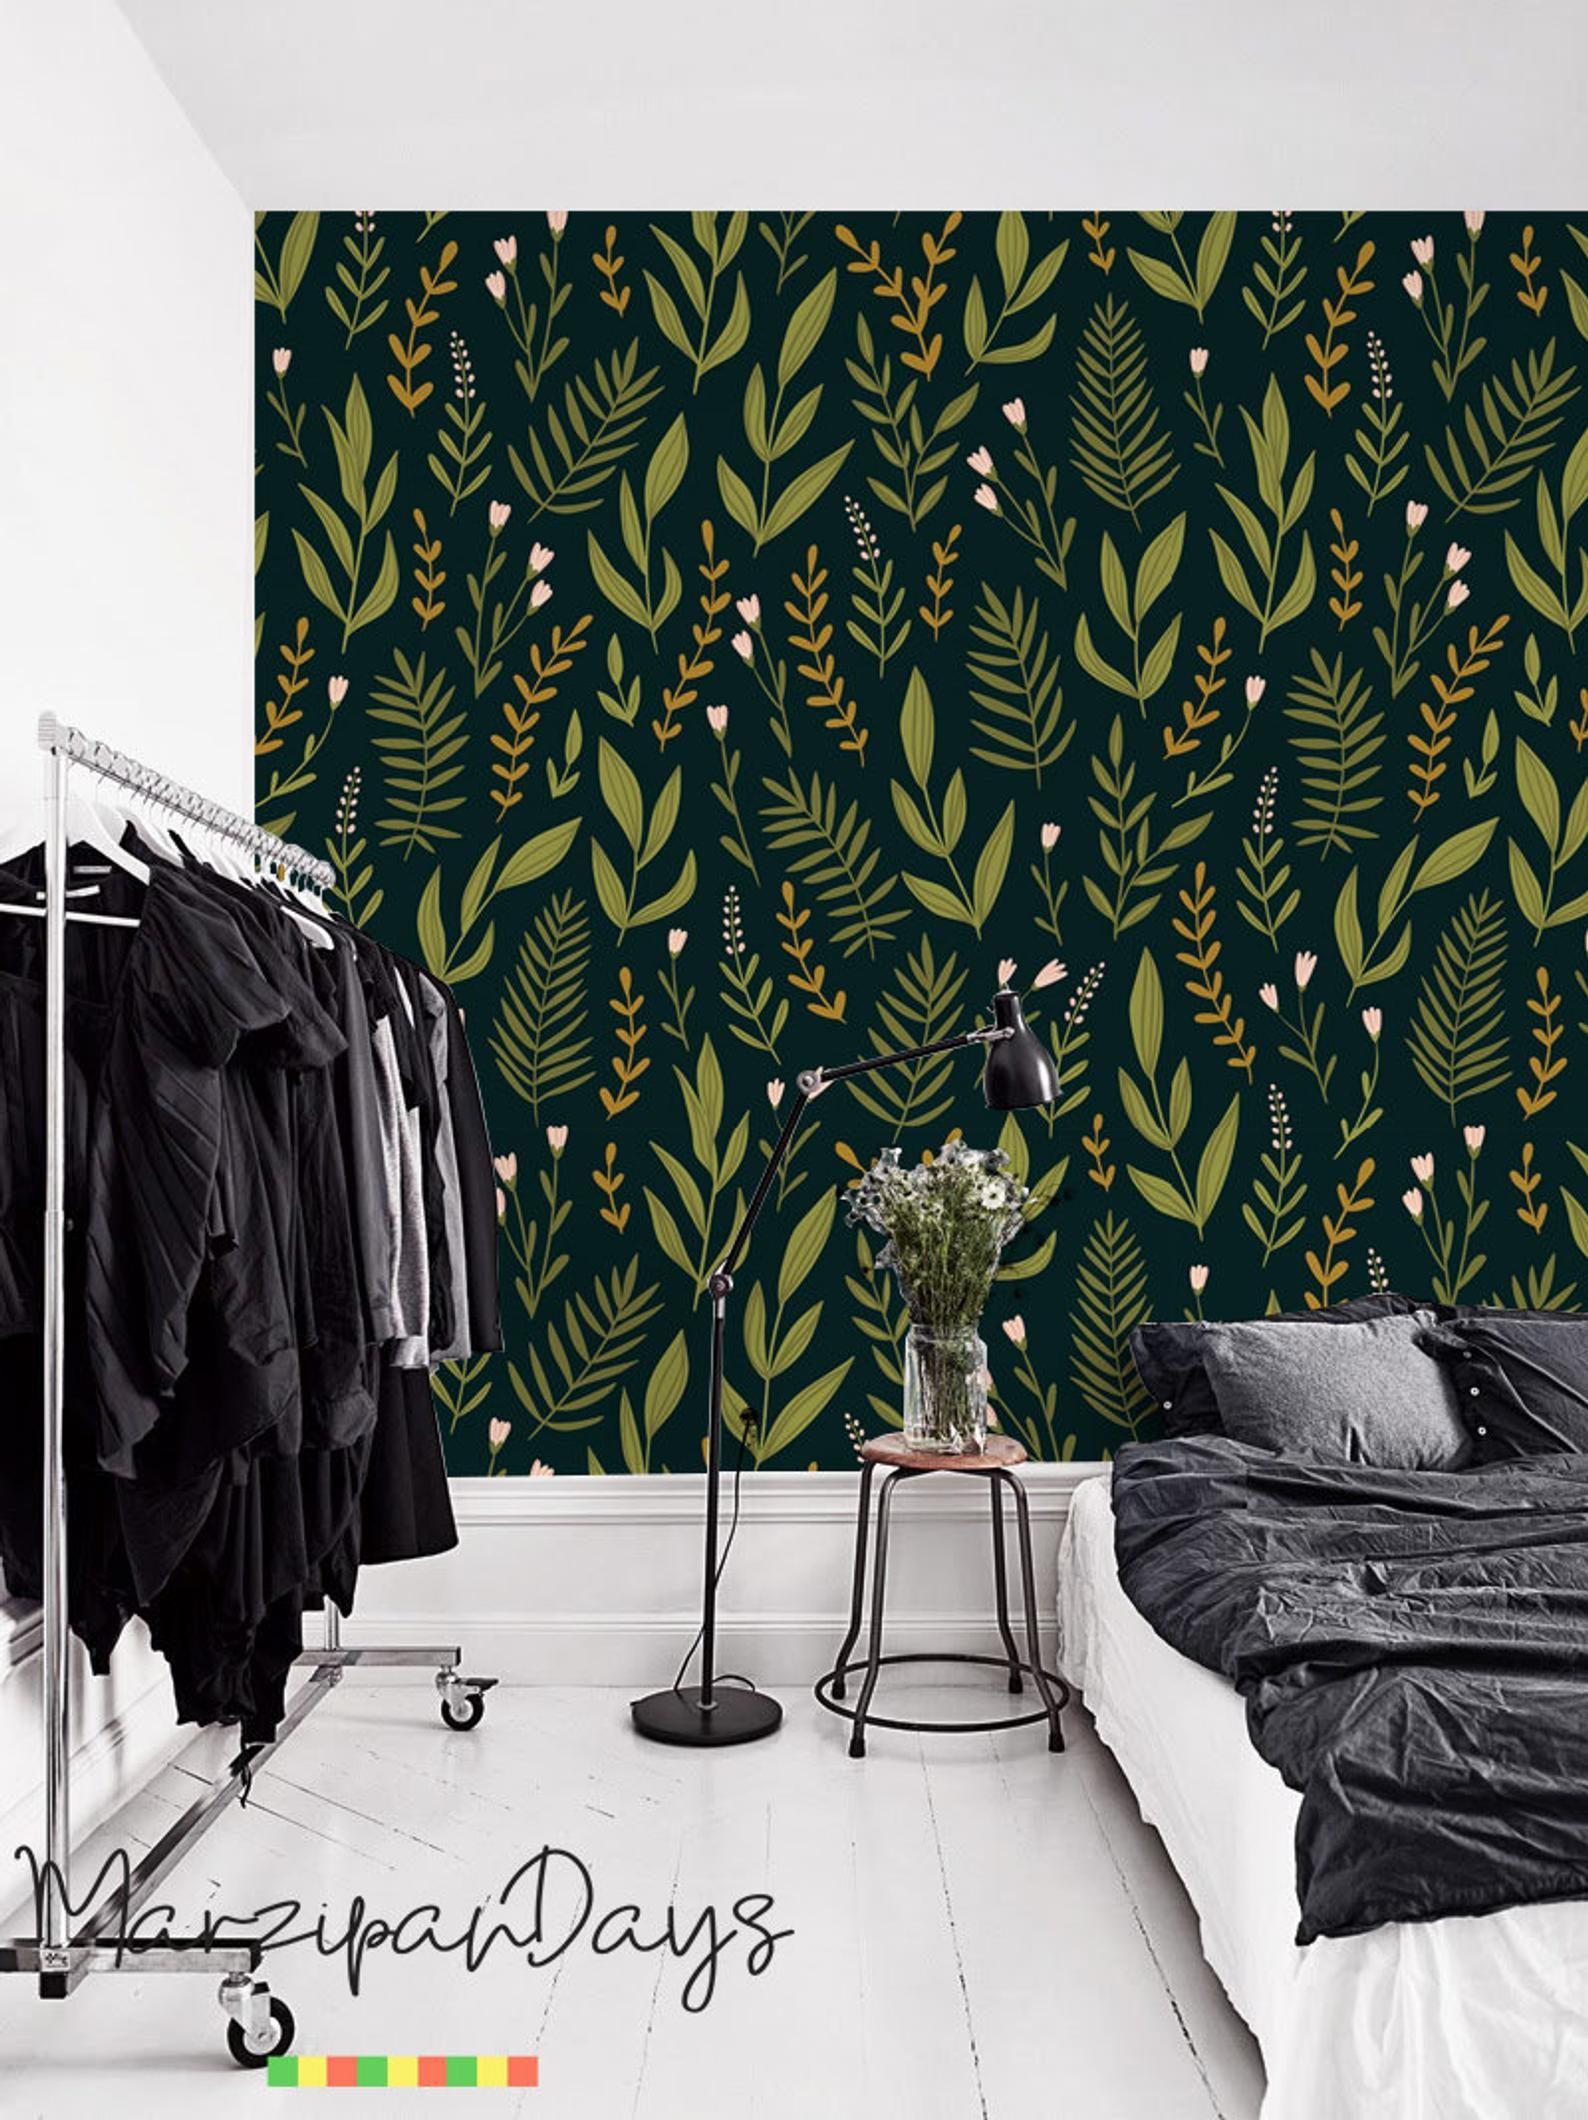 Herbs Dark Floral Wallpaper Botanical Wallpaper Removable Wallpaper Green Wall Decor Dark Floral Wall Mural Wall Decal Greenery 39